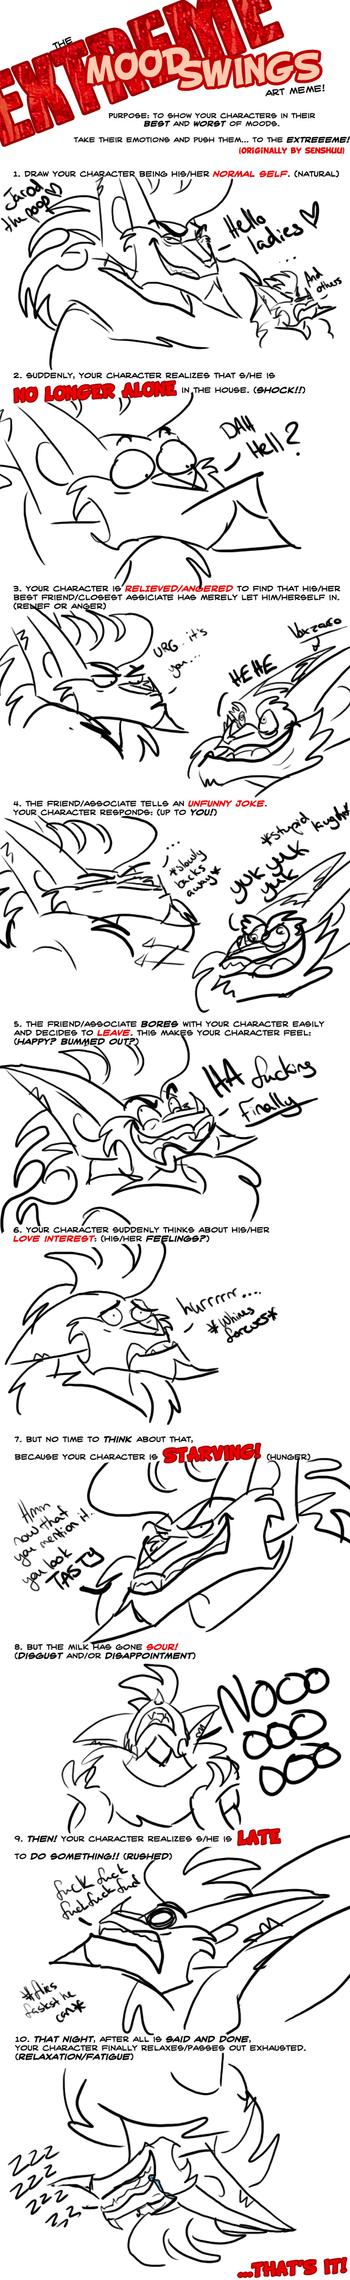 Extreme Mood Swings MEME by Luna1502